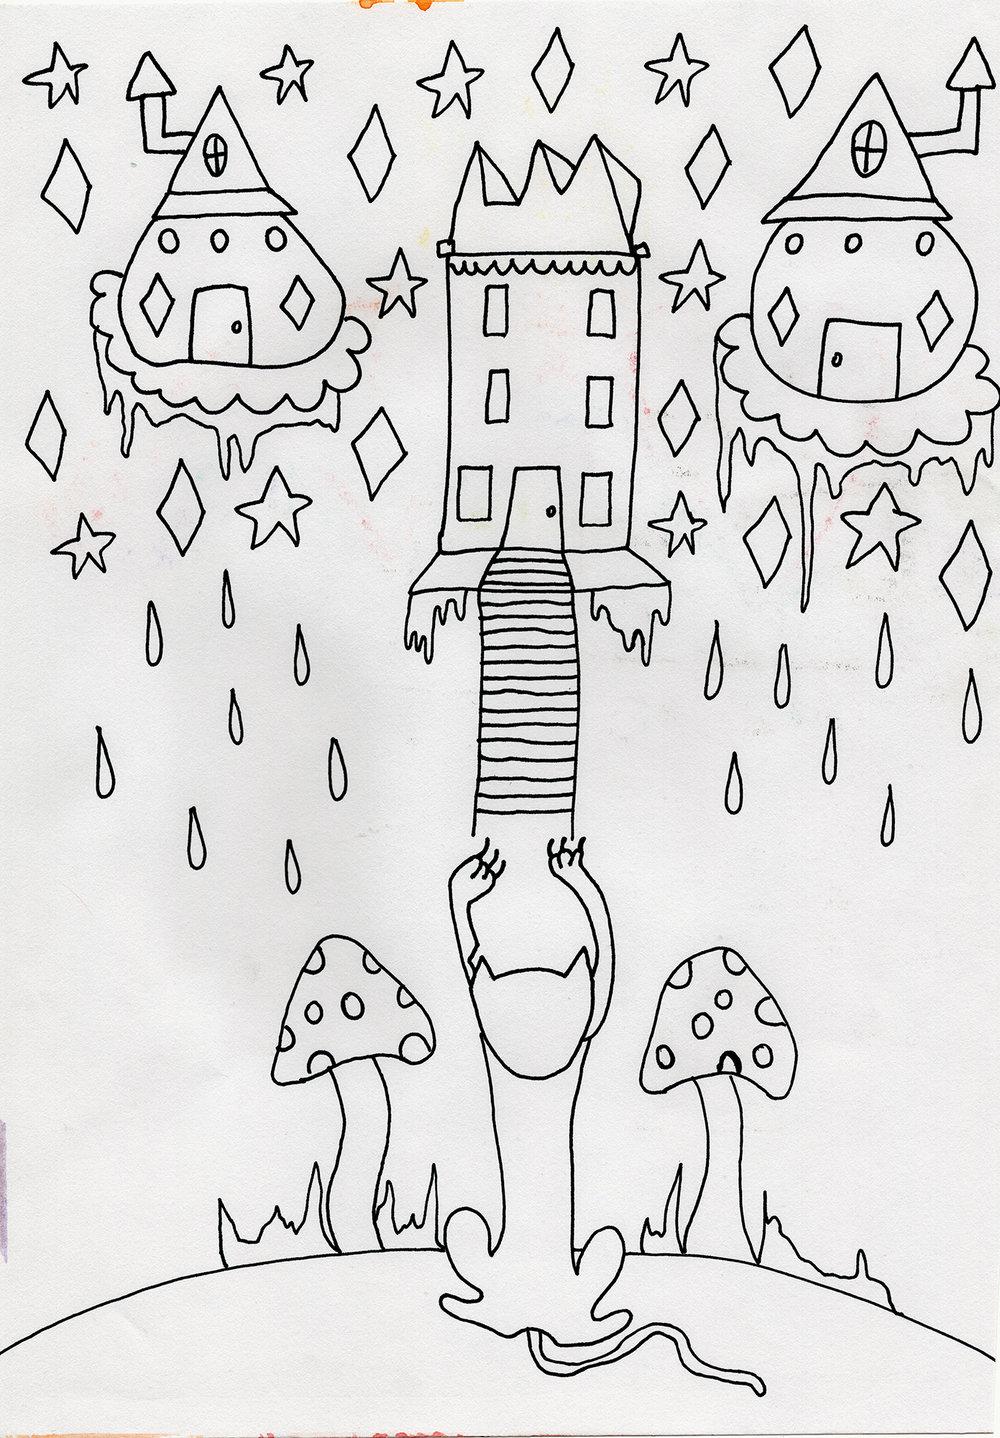 Left Star Sketch.jpg